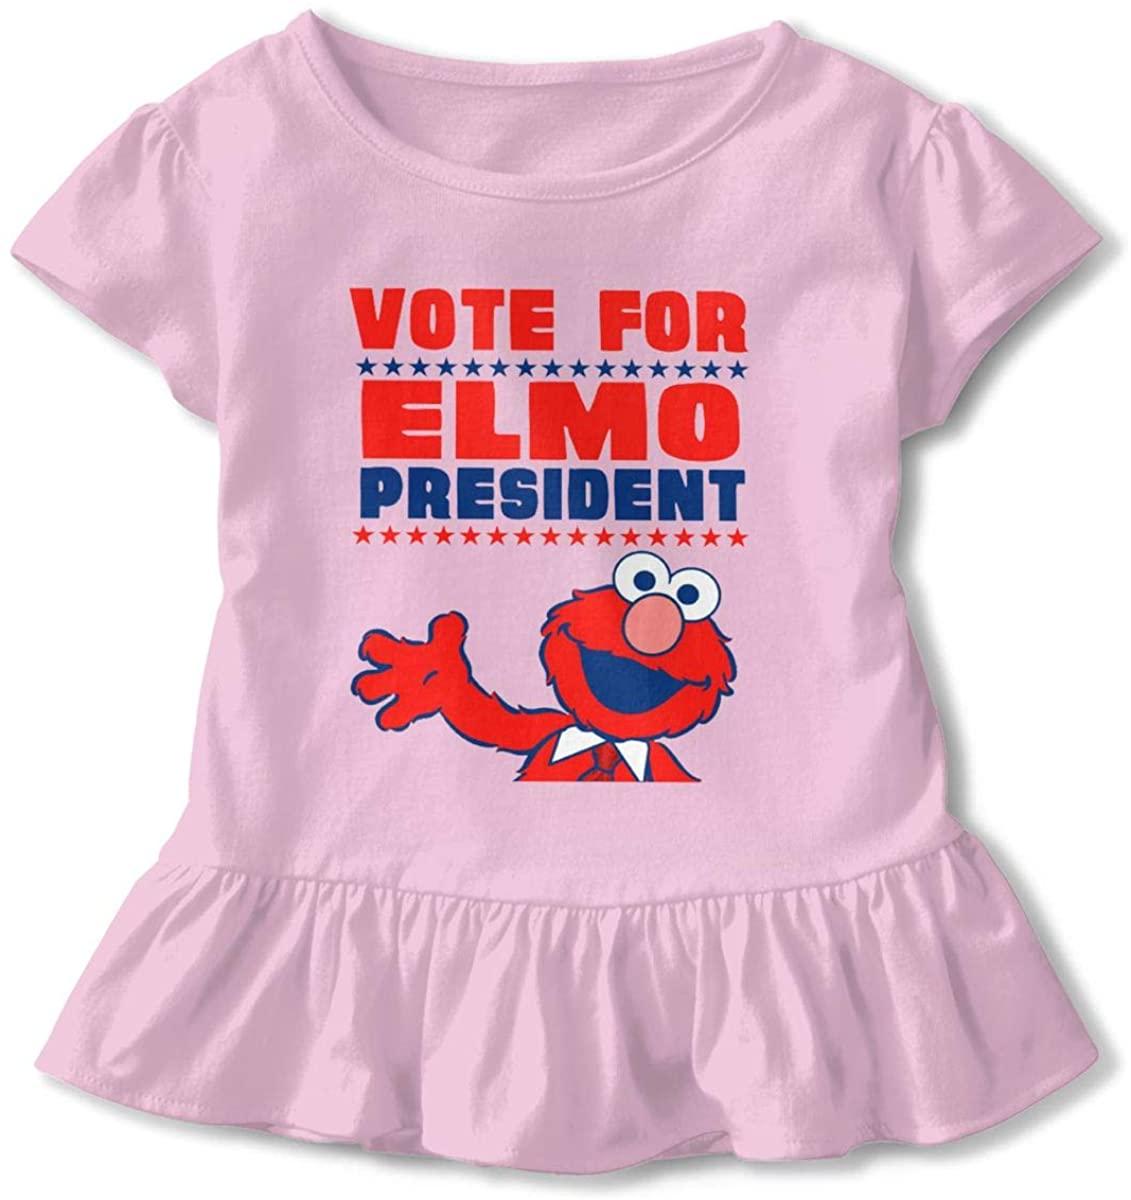 Kids Vote for Elmo Toddler Short Sleeve T Shirt Children Girls Cotton Graphic Tee Soft Dress (2-6T)